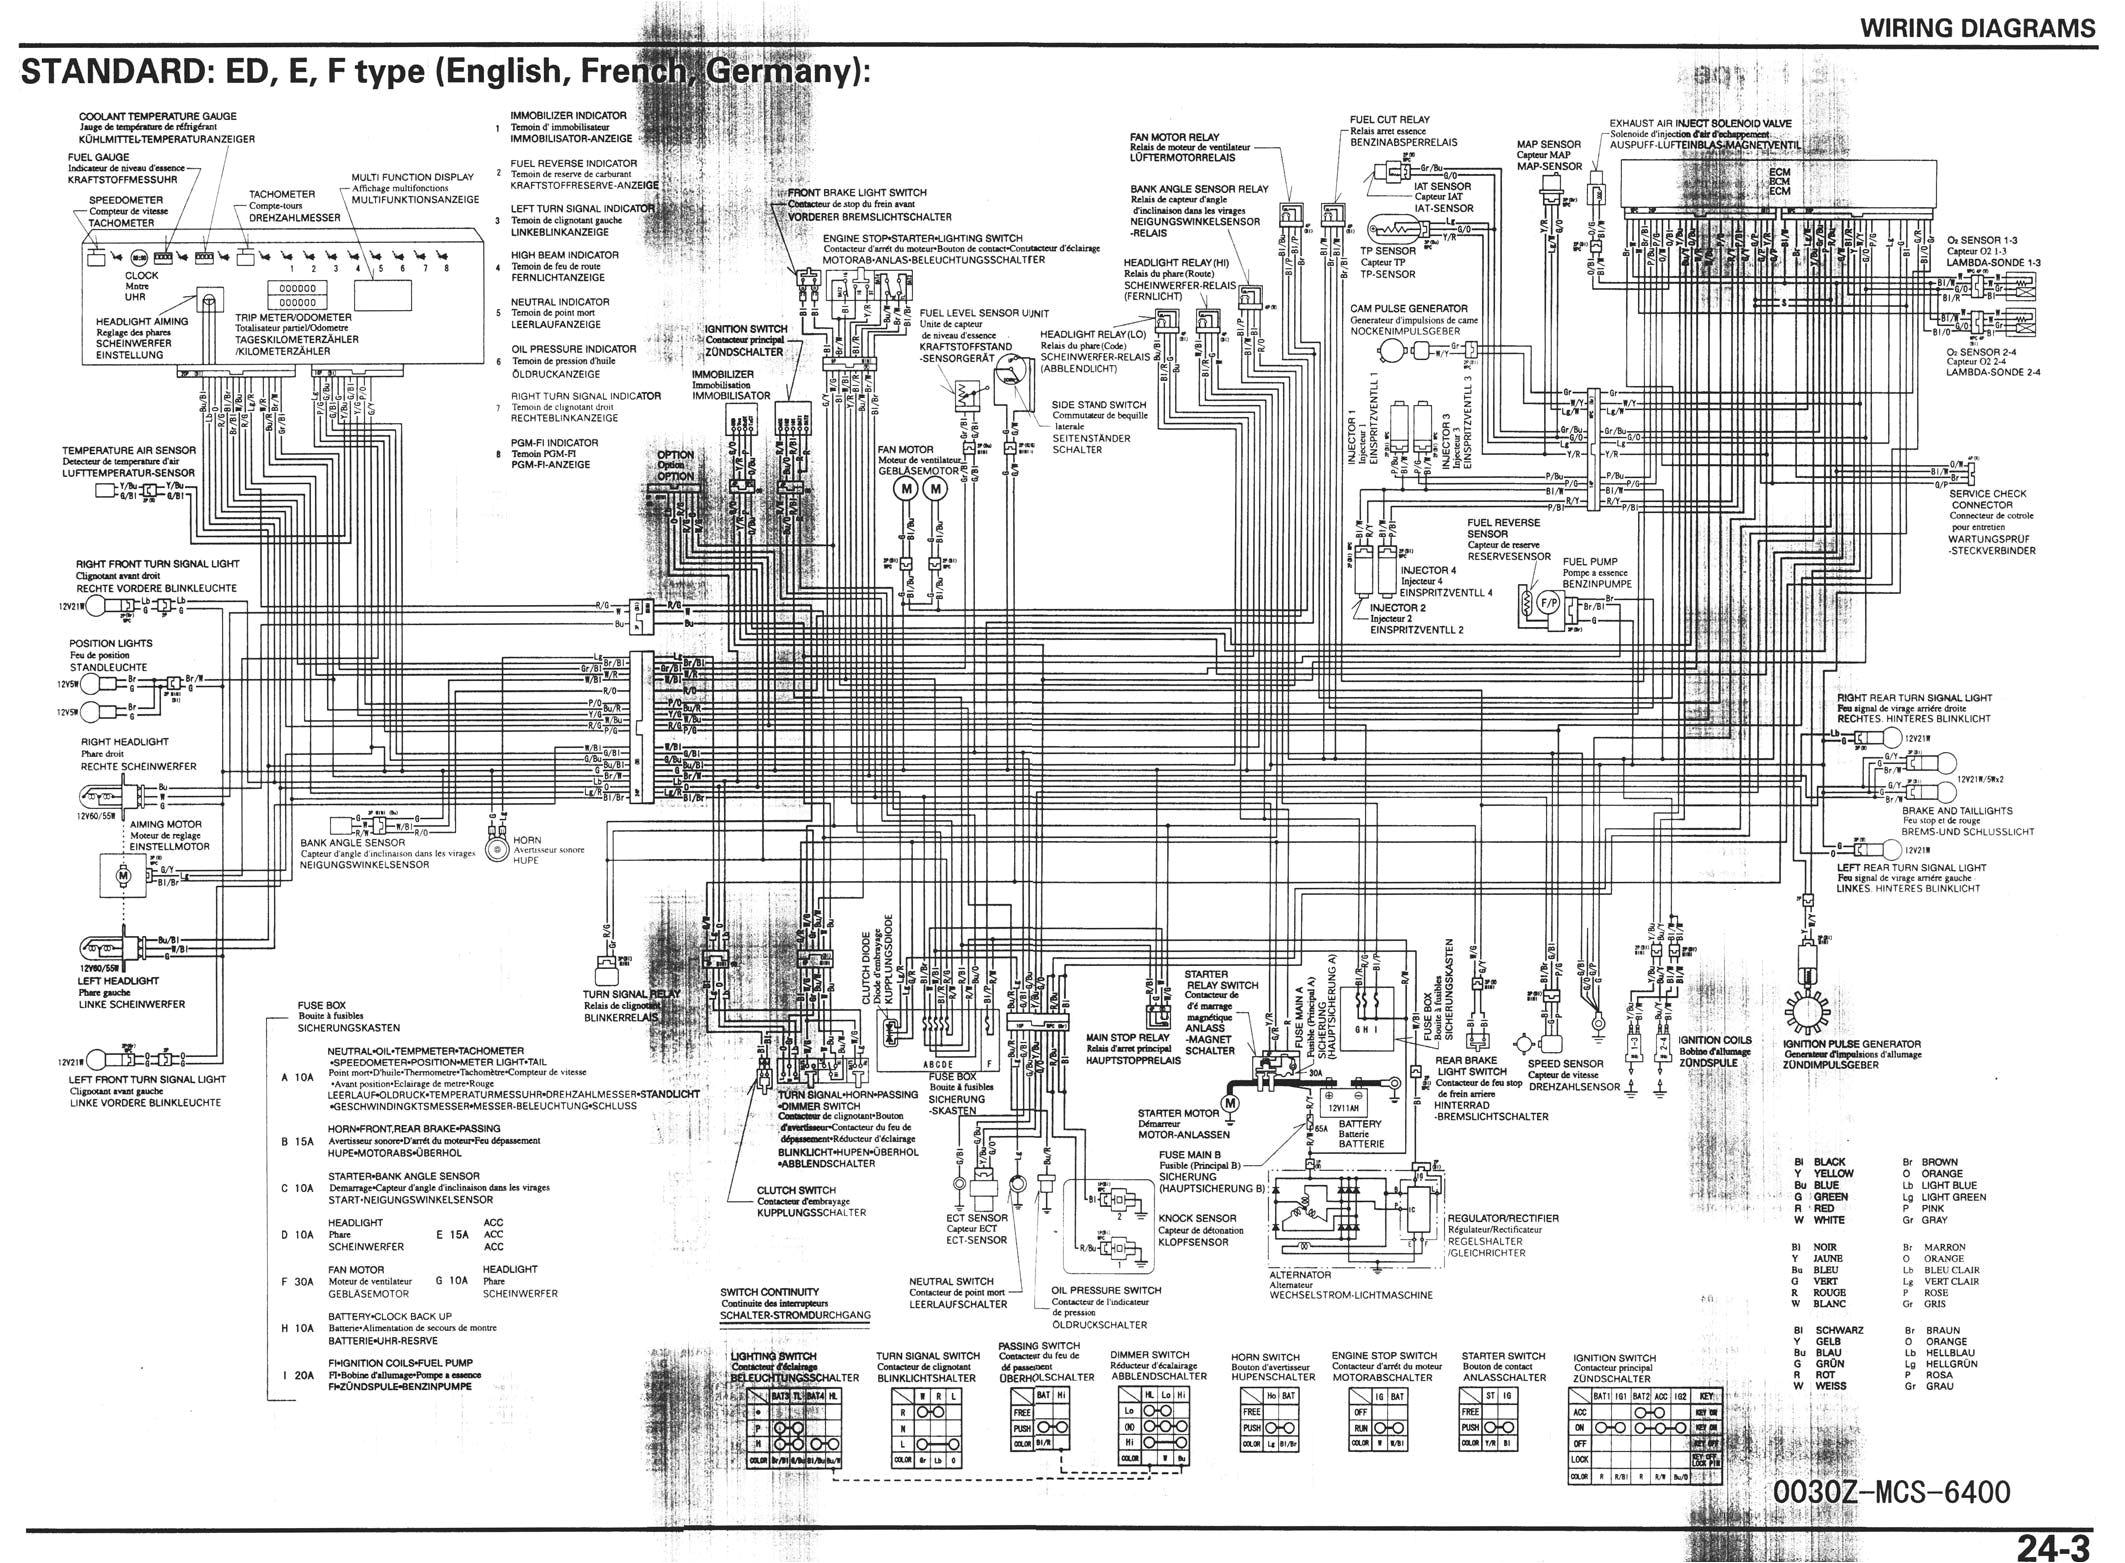 bmw diagram wirings wiring diagram preview bmw diagram wirings